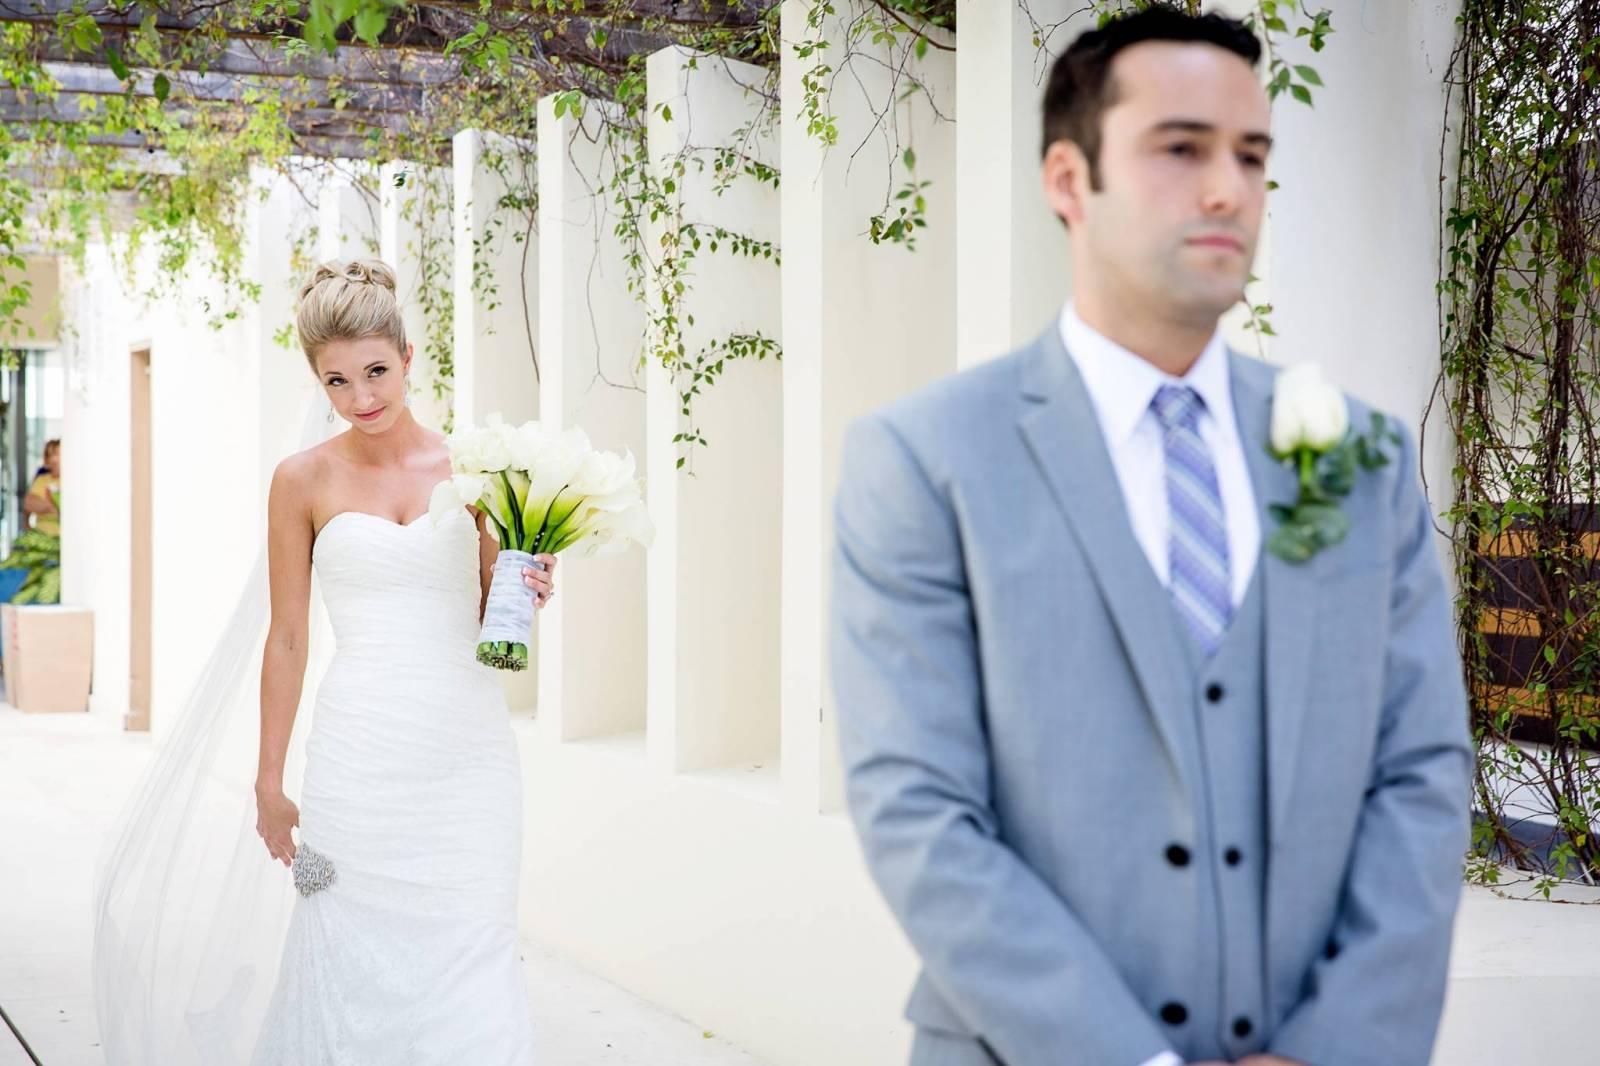 A beautiful destination wedding in Huatulco, Mexico | Huatulco ...